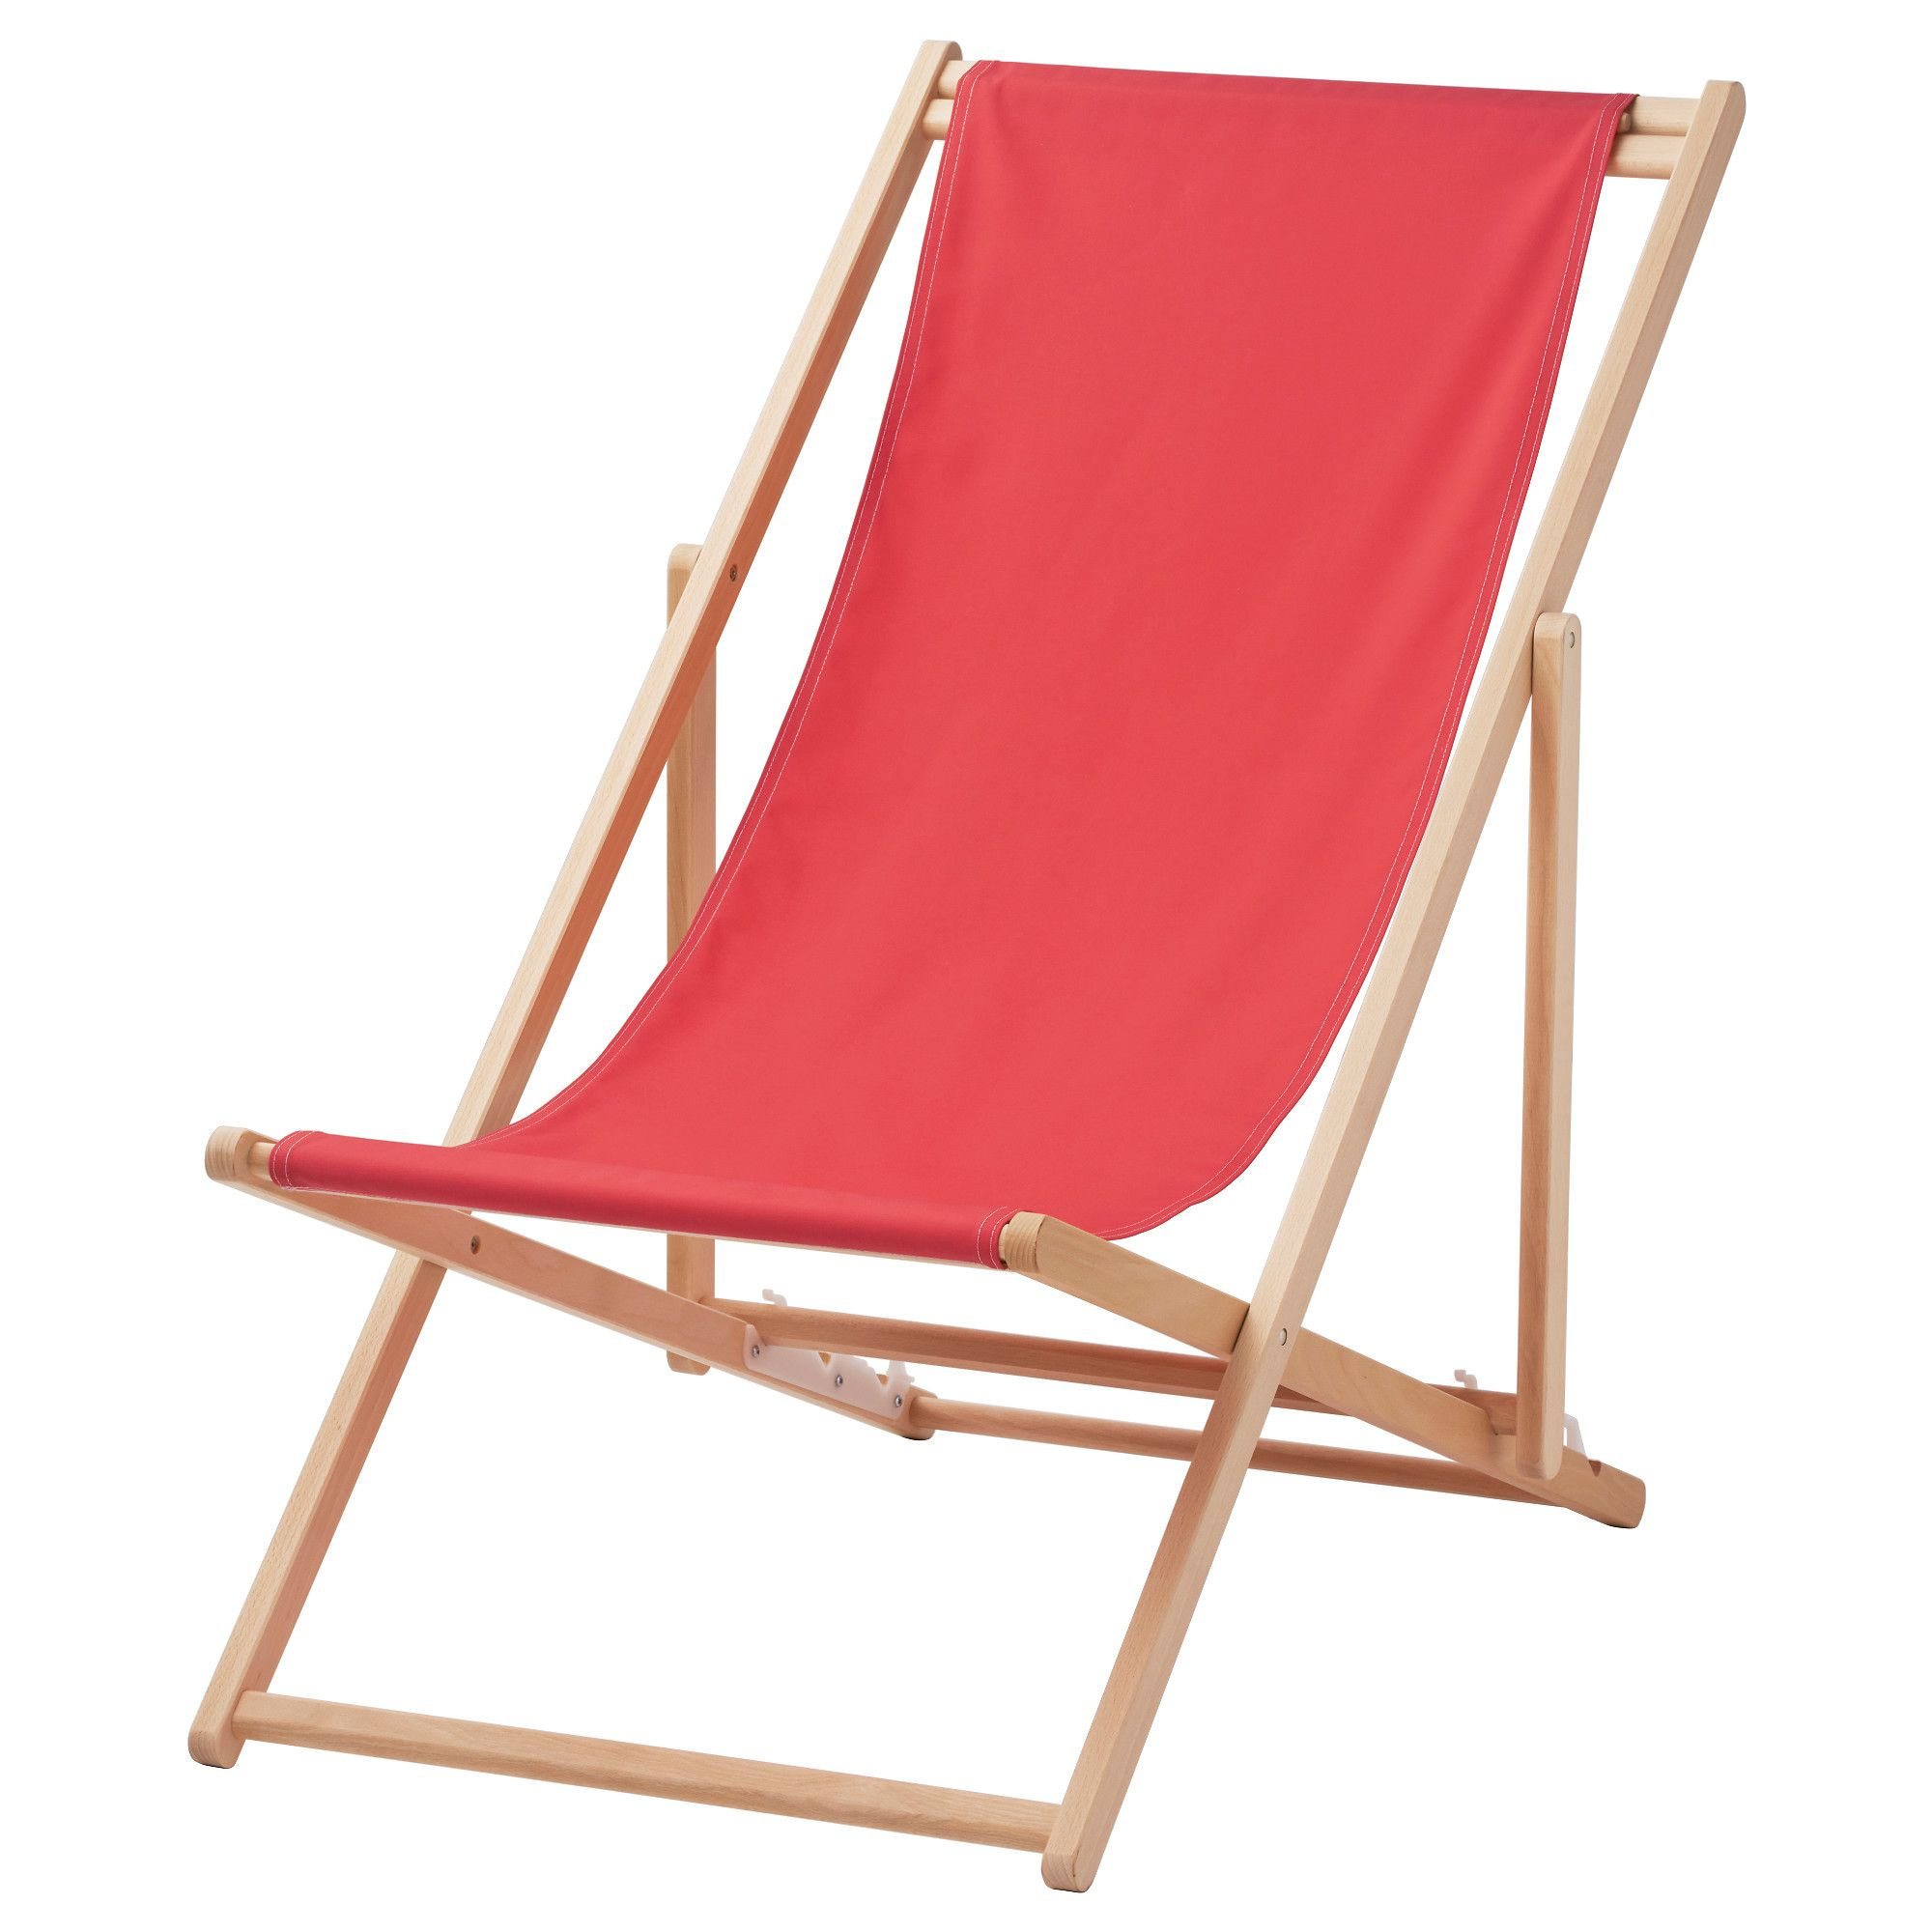 Us - Furniture And Home Furnishings | Rattan Effect Garden ... à Transat Jardin Ikea